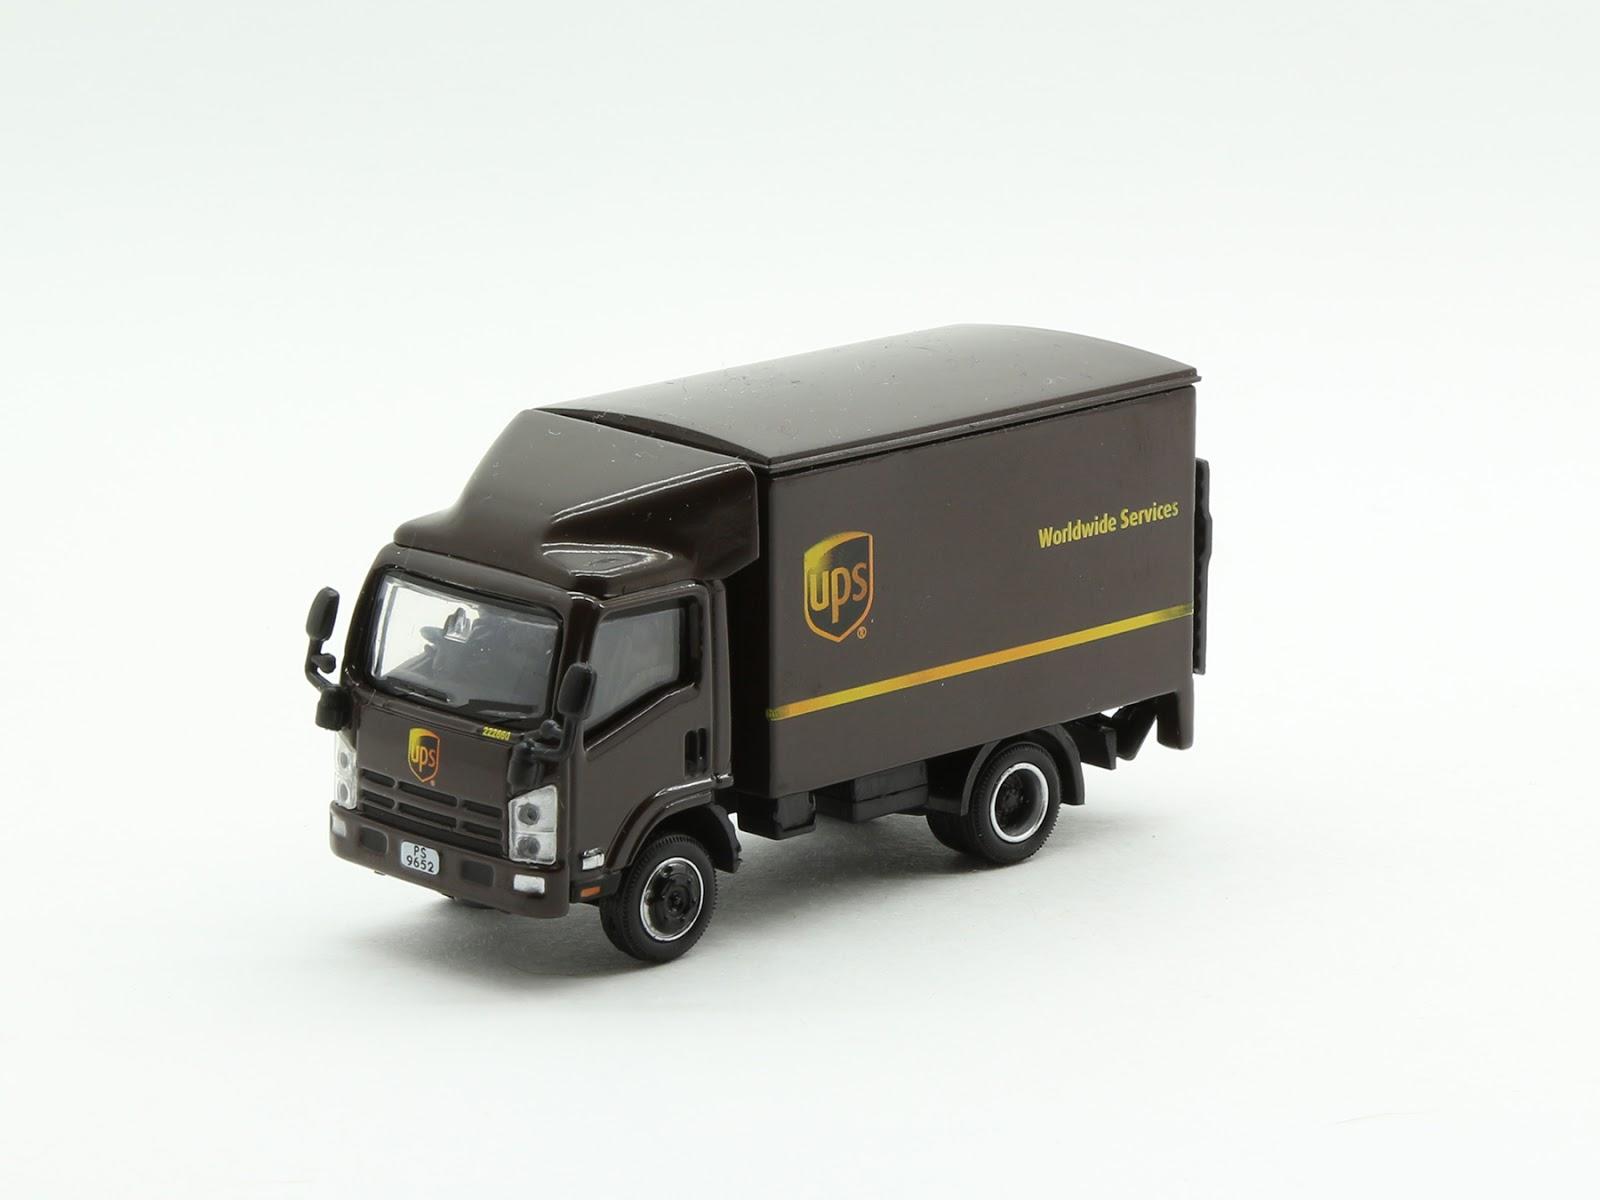 Incredible Mini Garage: Isuzu N Series 2008 UPS 1/76 Tiny